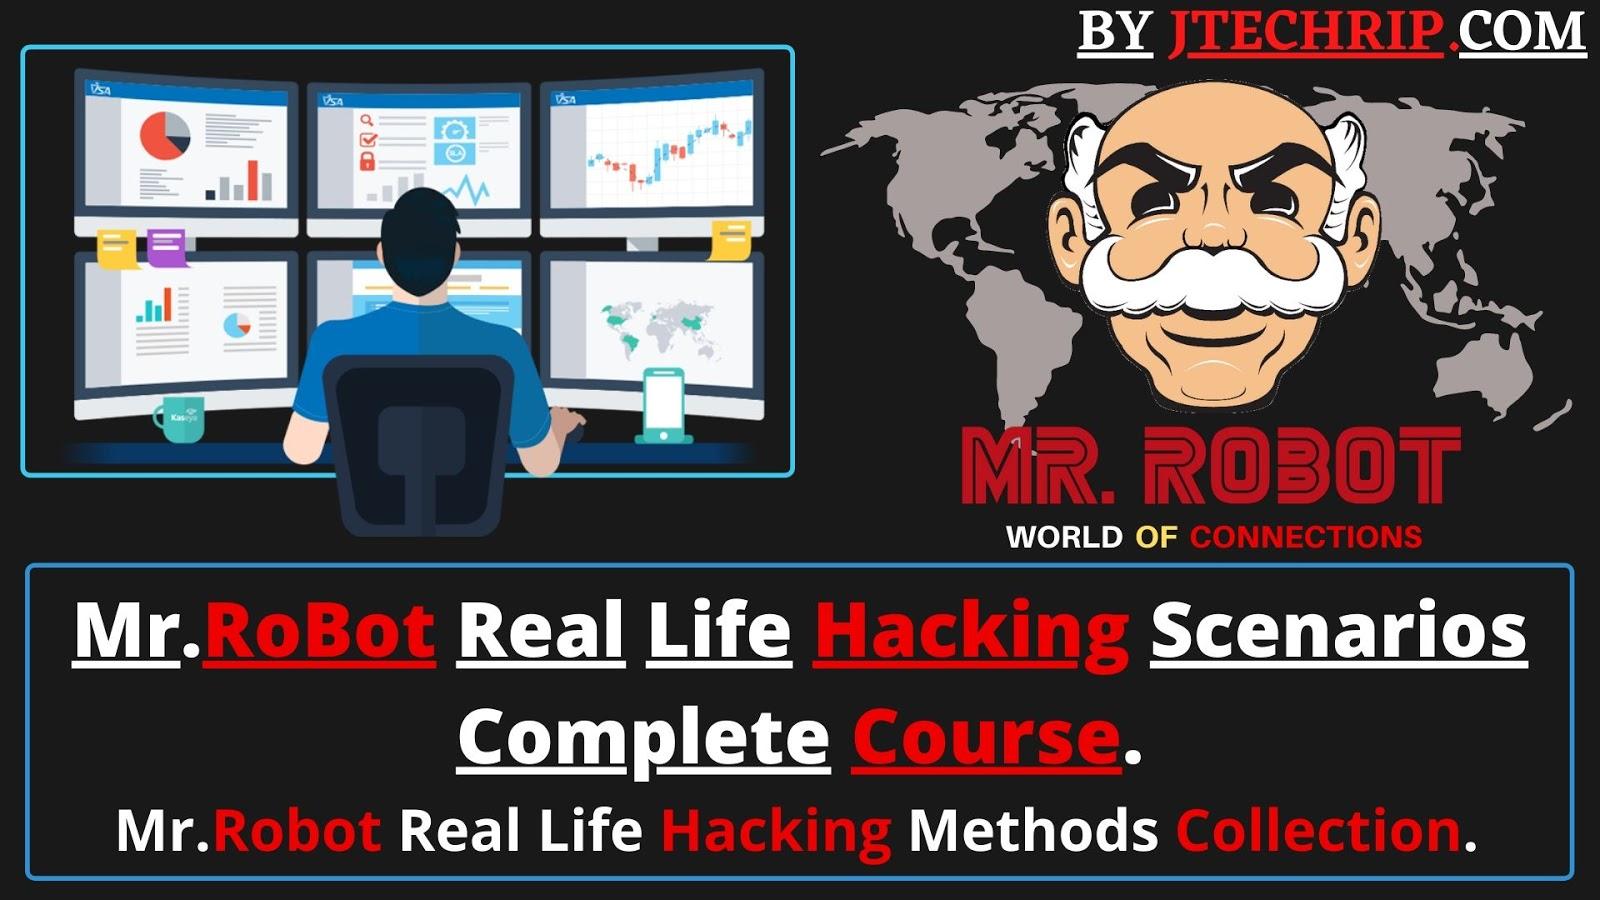 JTECHRIP.COM Mr.RoBot Real Life Hacking Scenarios Complete Course.